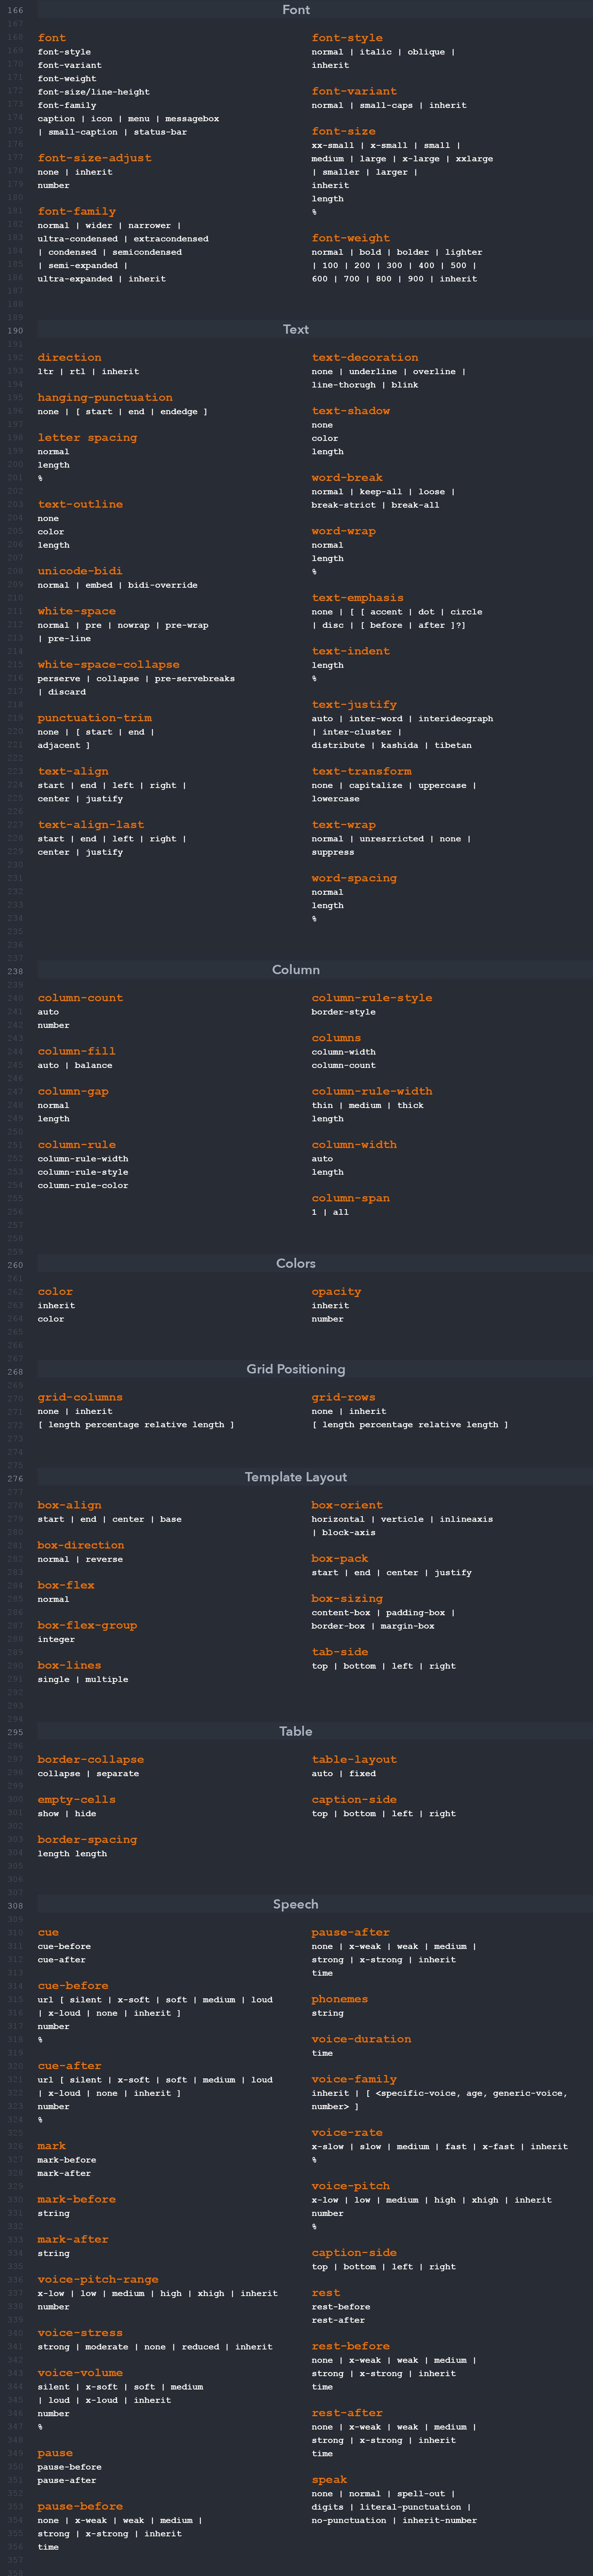 css-cheat-sheet-p2